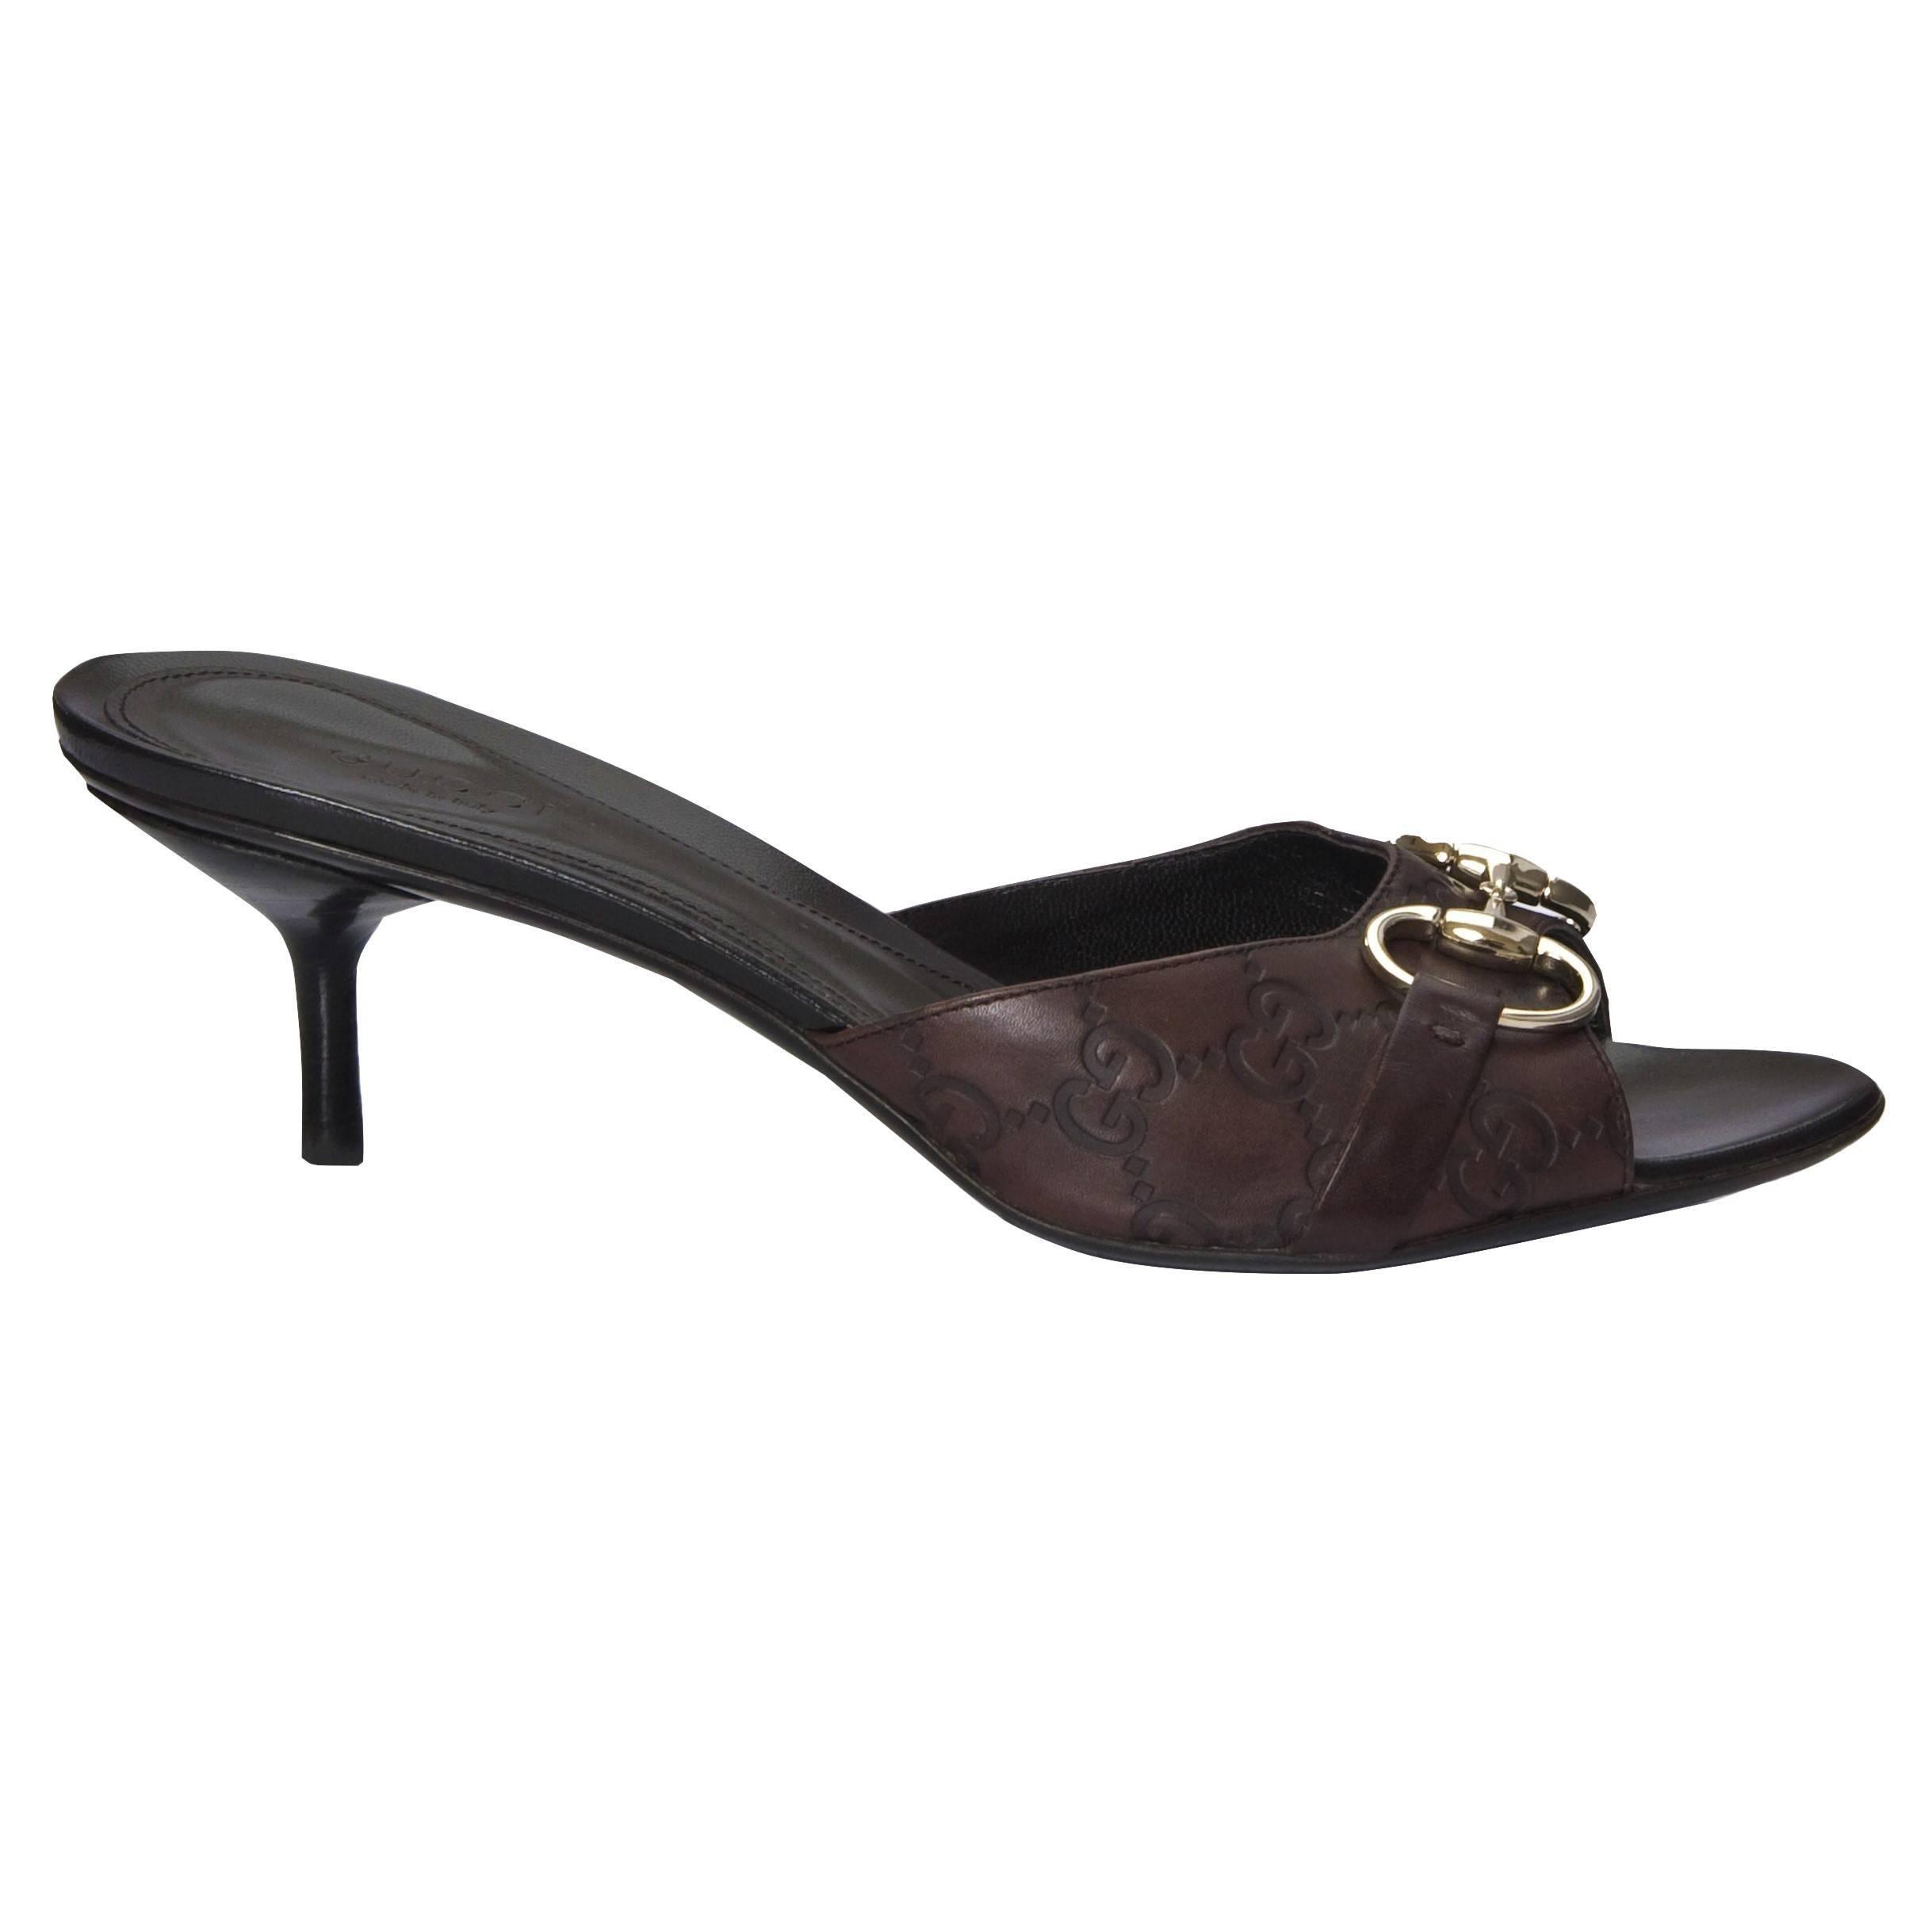 3c770af31c1 Gucci Size 7.5 Guccissima Horsebit Heels Slides Mules at 1stdibs